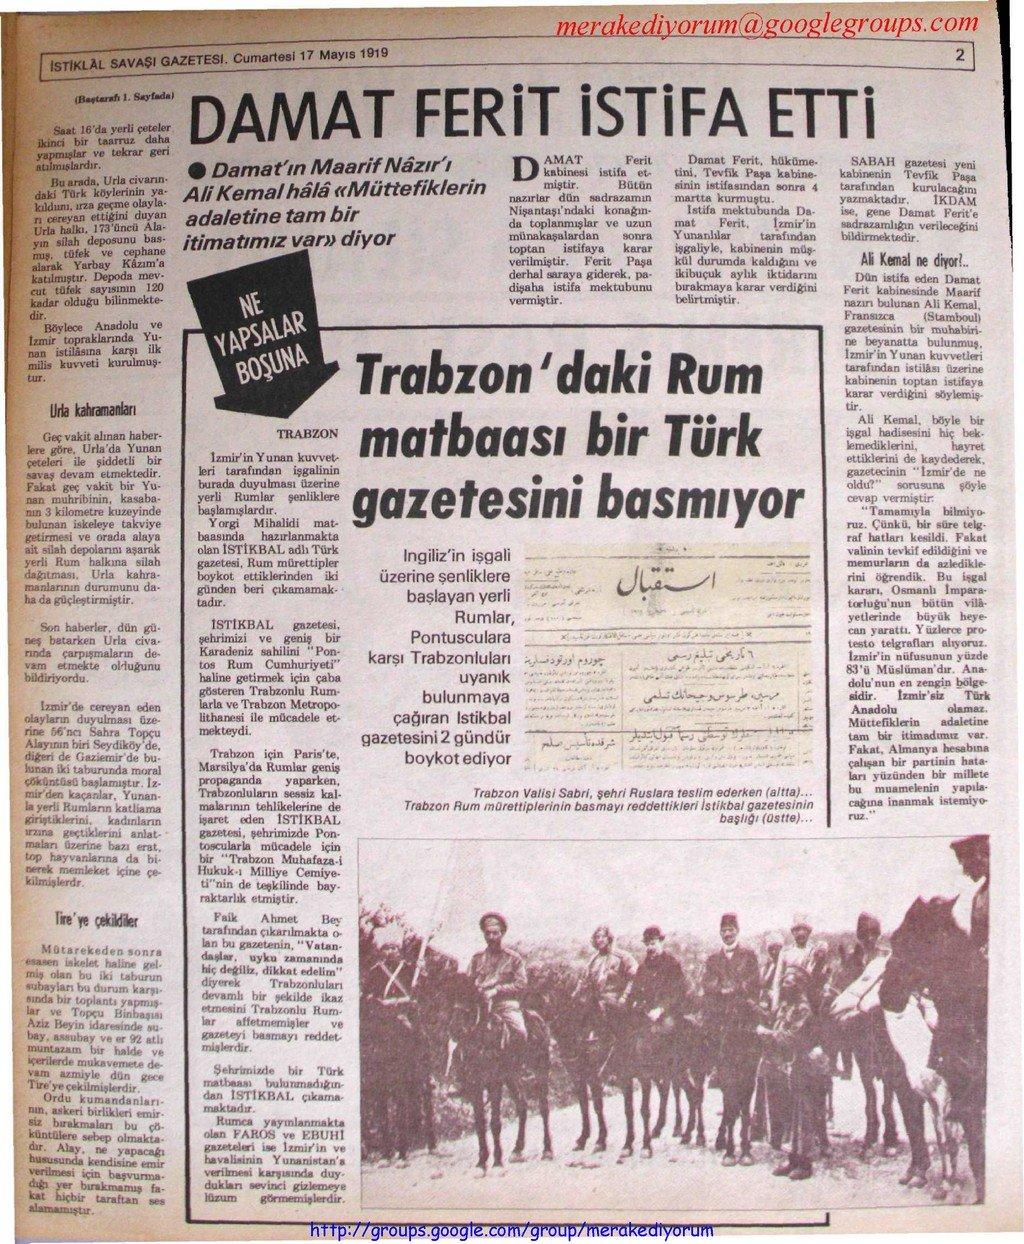 istiklal savaşı gazetesi - 17 mayıs 1919